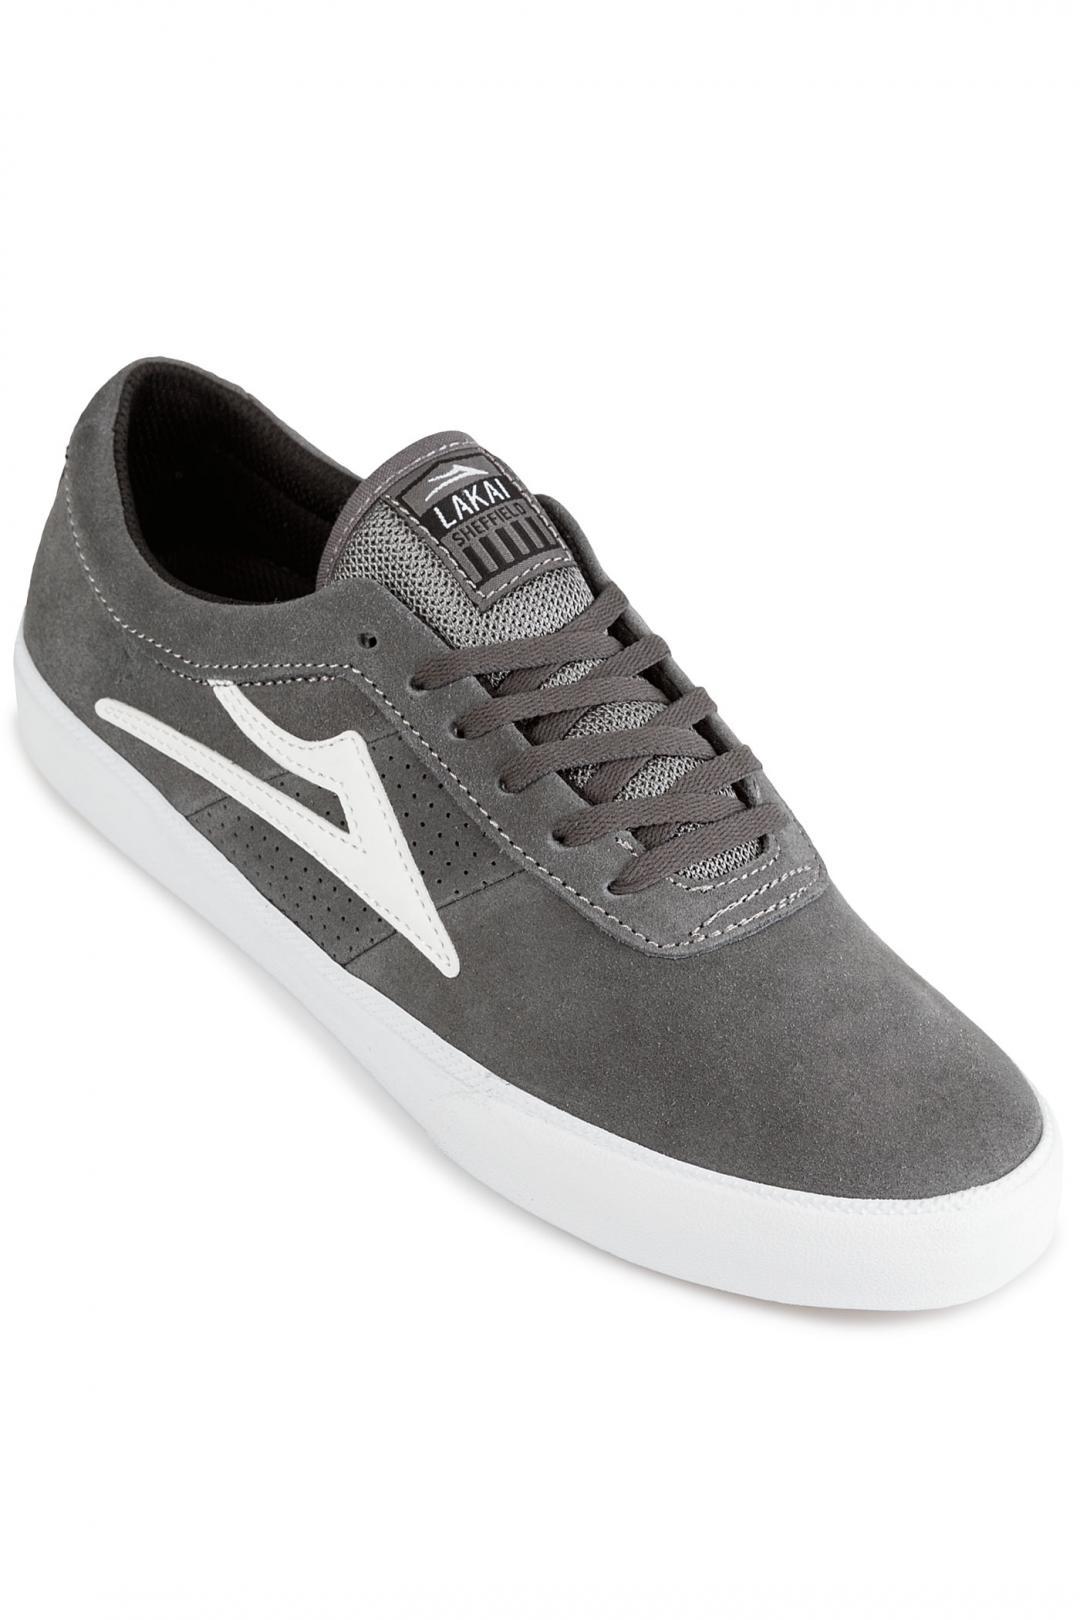 Uomo Lakai Sheffield grey | Sneakers low top